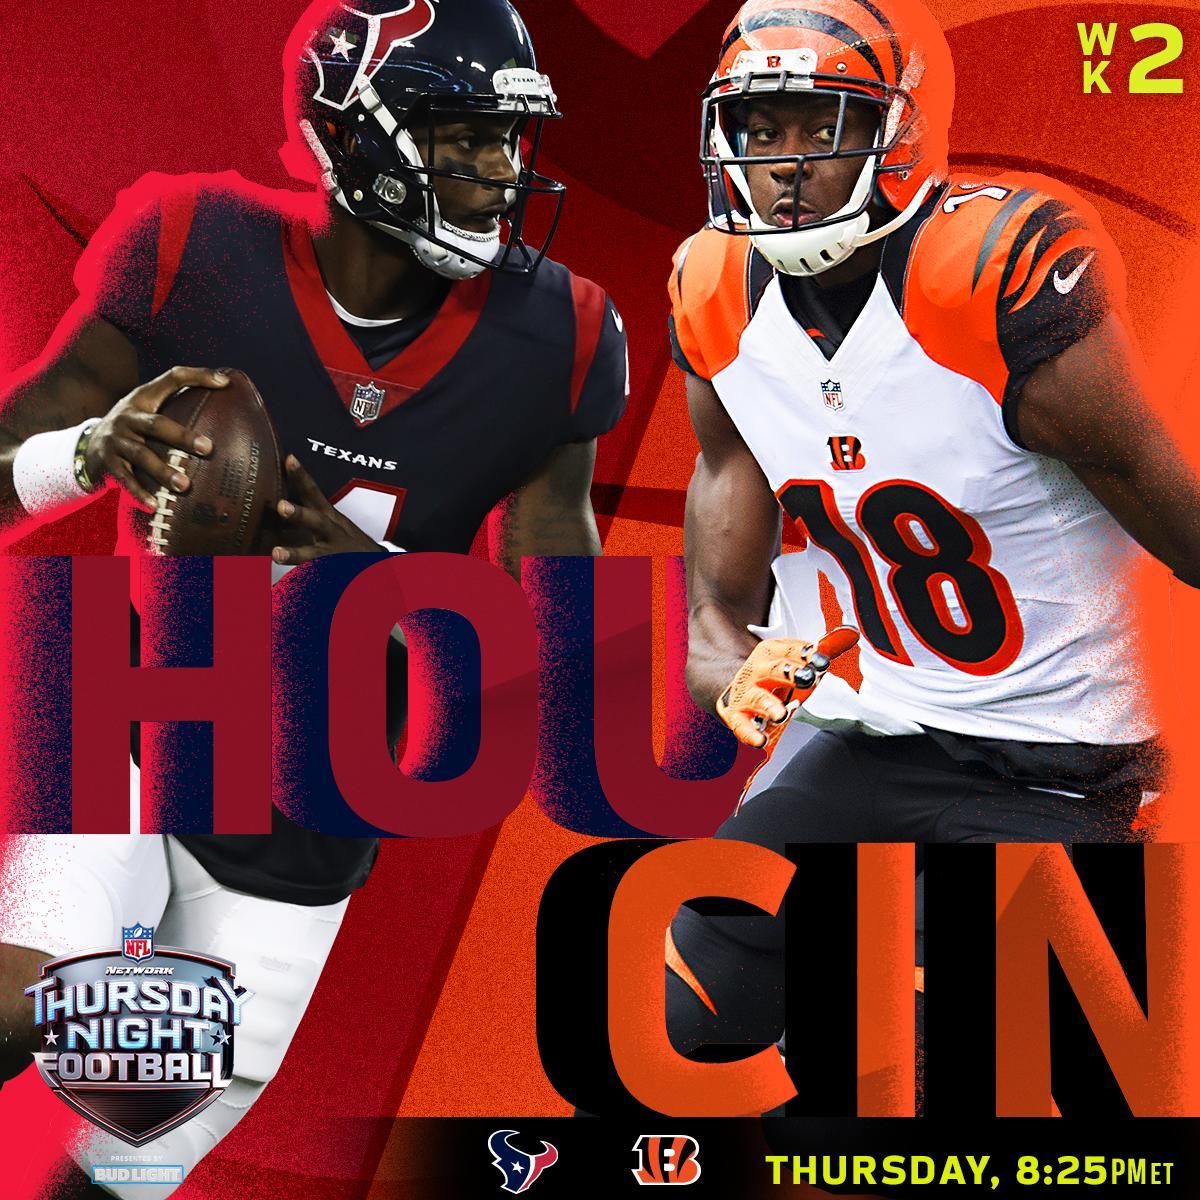 Thursday Night Football is BACK. @HoustonTexans. @Bengals.  Only on @nflnetwork (8:25pm ET). #TNF #HOUvsCIN https://t.co/QgIMCiTJiO